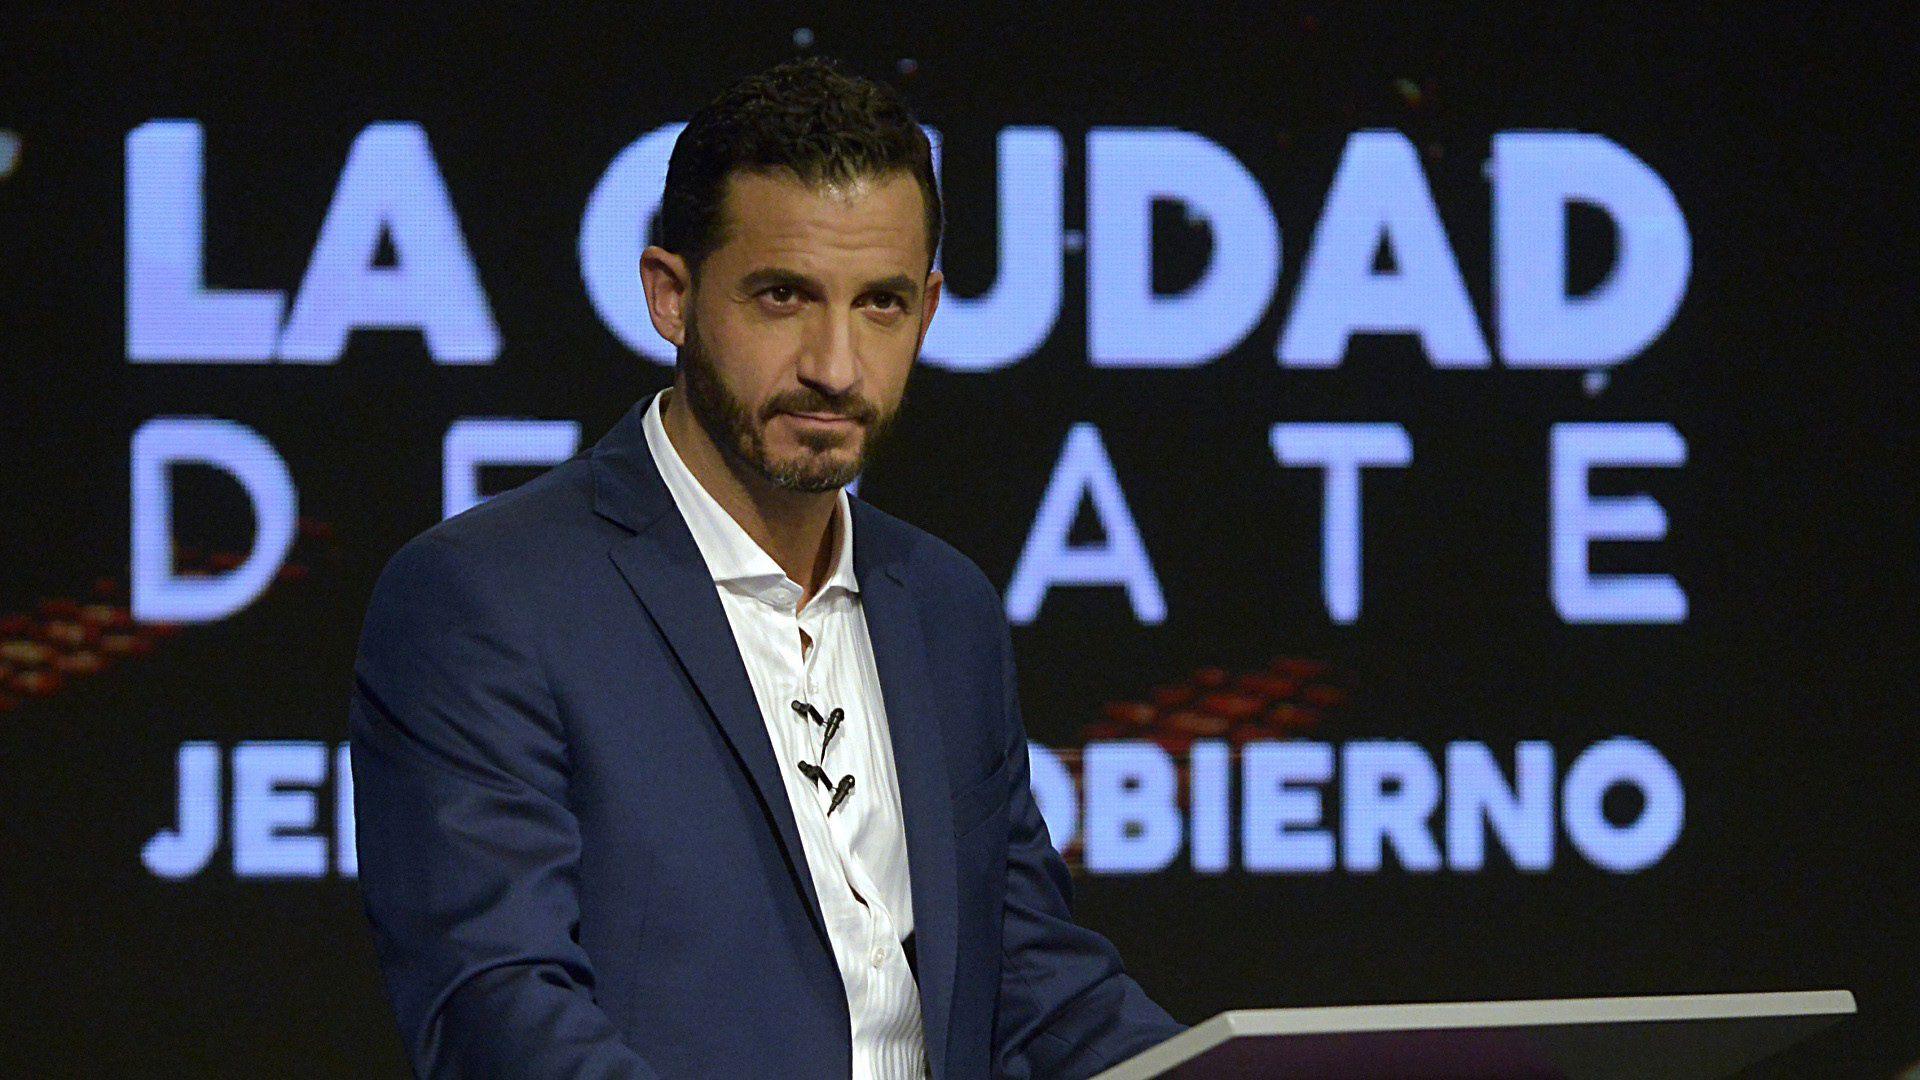 El candidato de Consenso Federal, Matías Tombolini